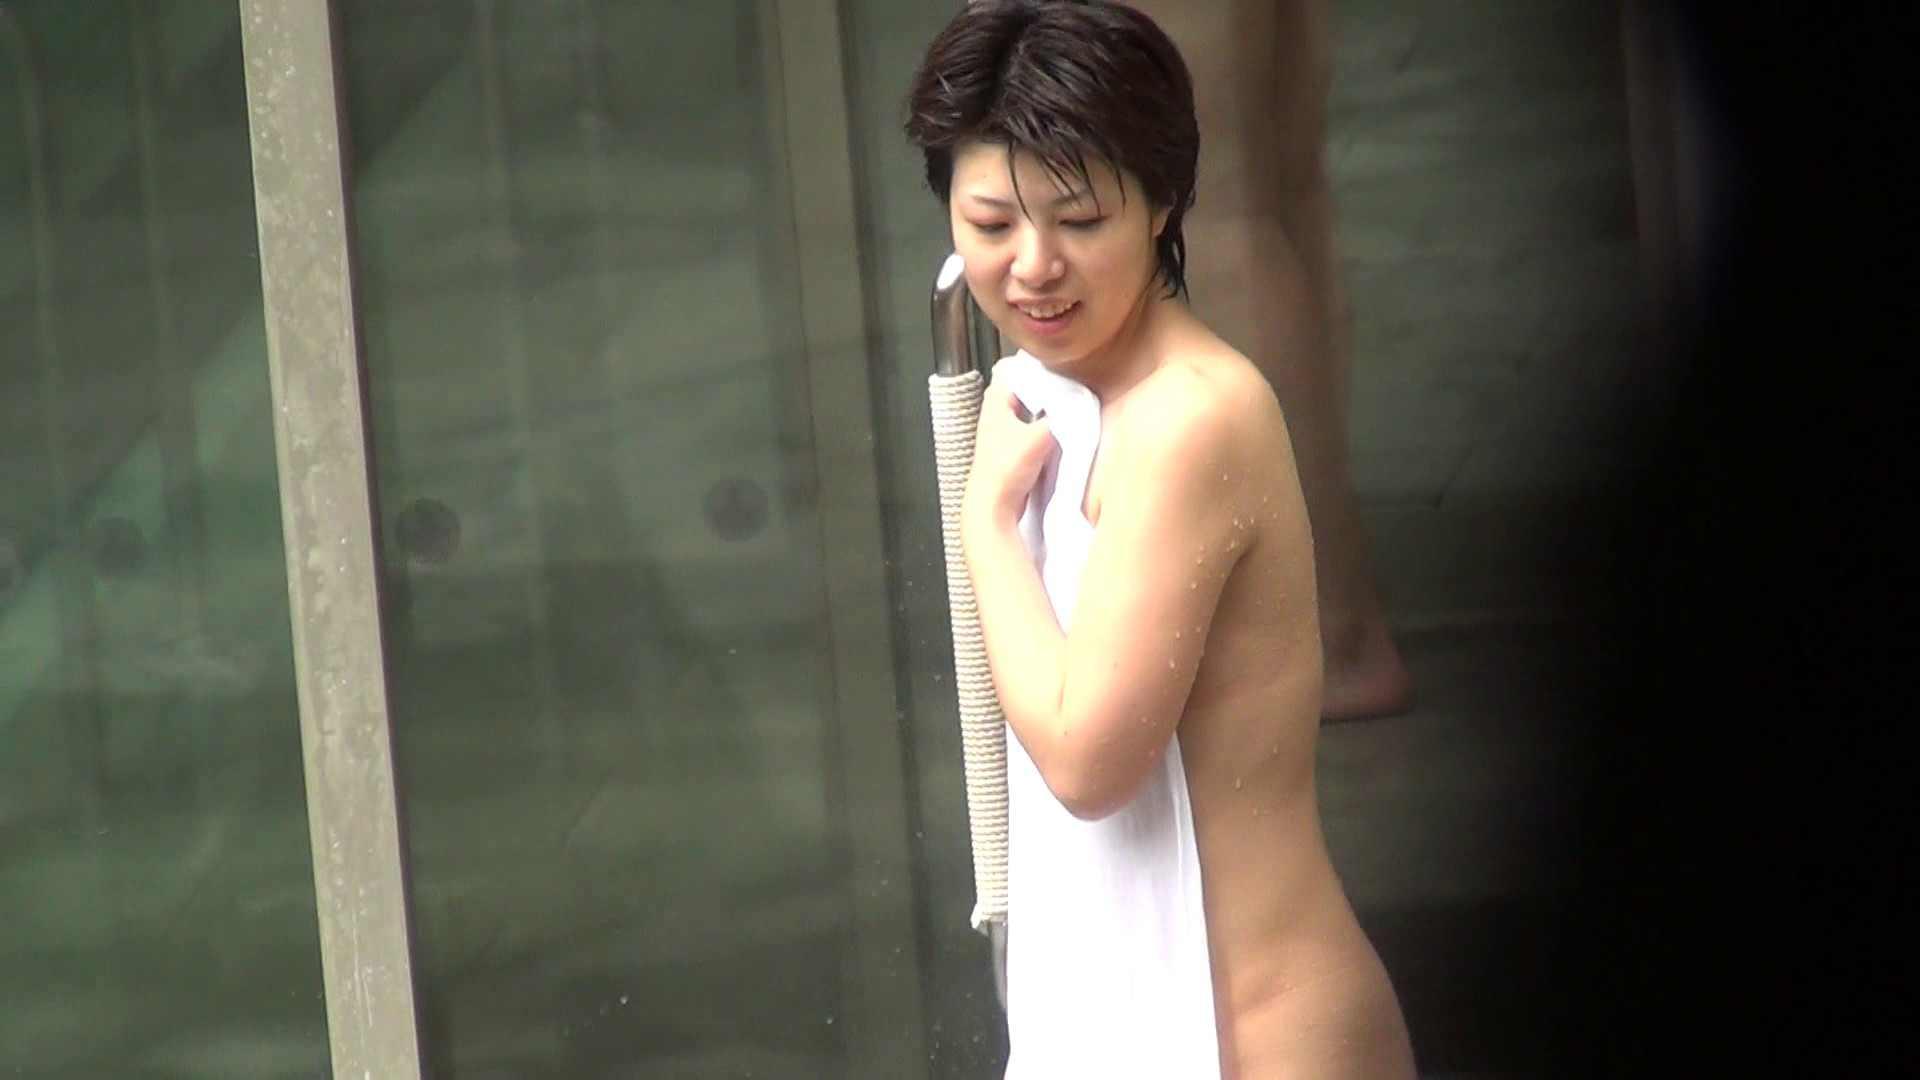 Aquaな露天風呂Vol.312 エッチな盗撮 AV無料 109pic 63